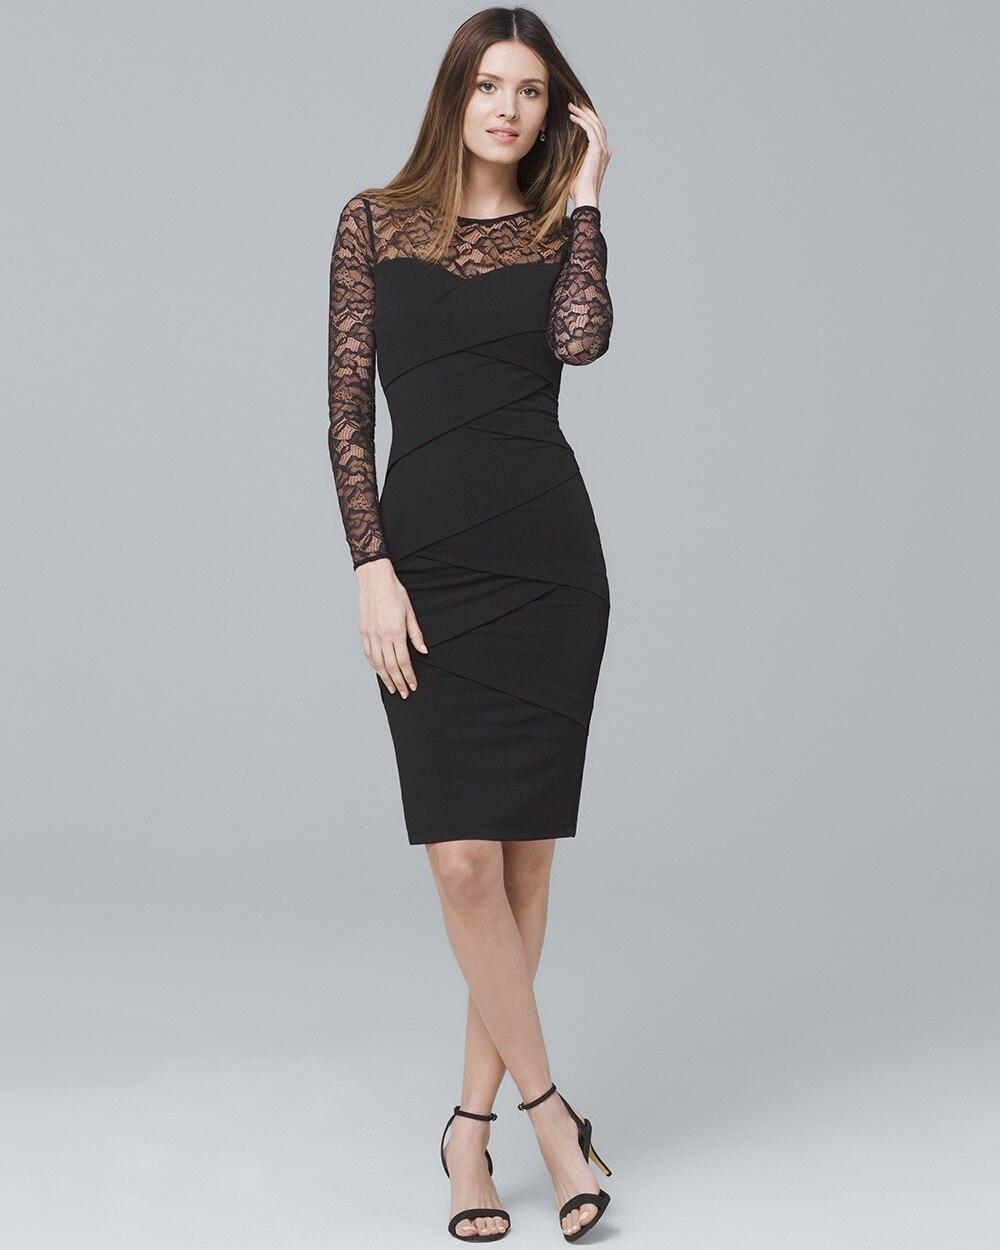 c76d5273843 Black Lace Instantly Slimming Dress - White House Black Market